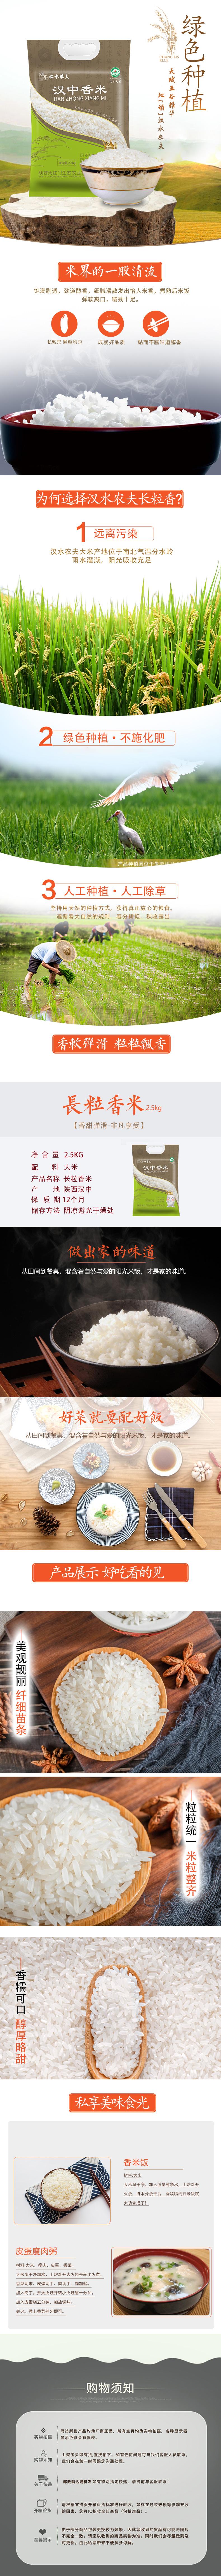 2.5KG汉中香米详情图.jpg